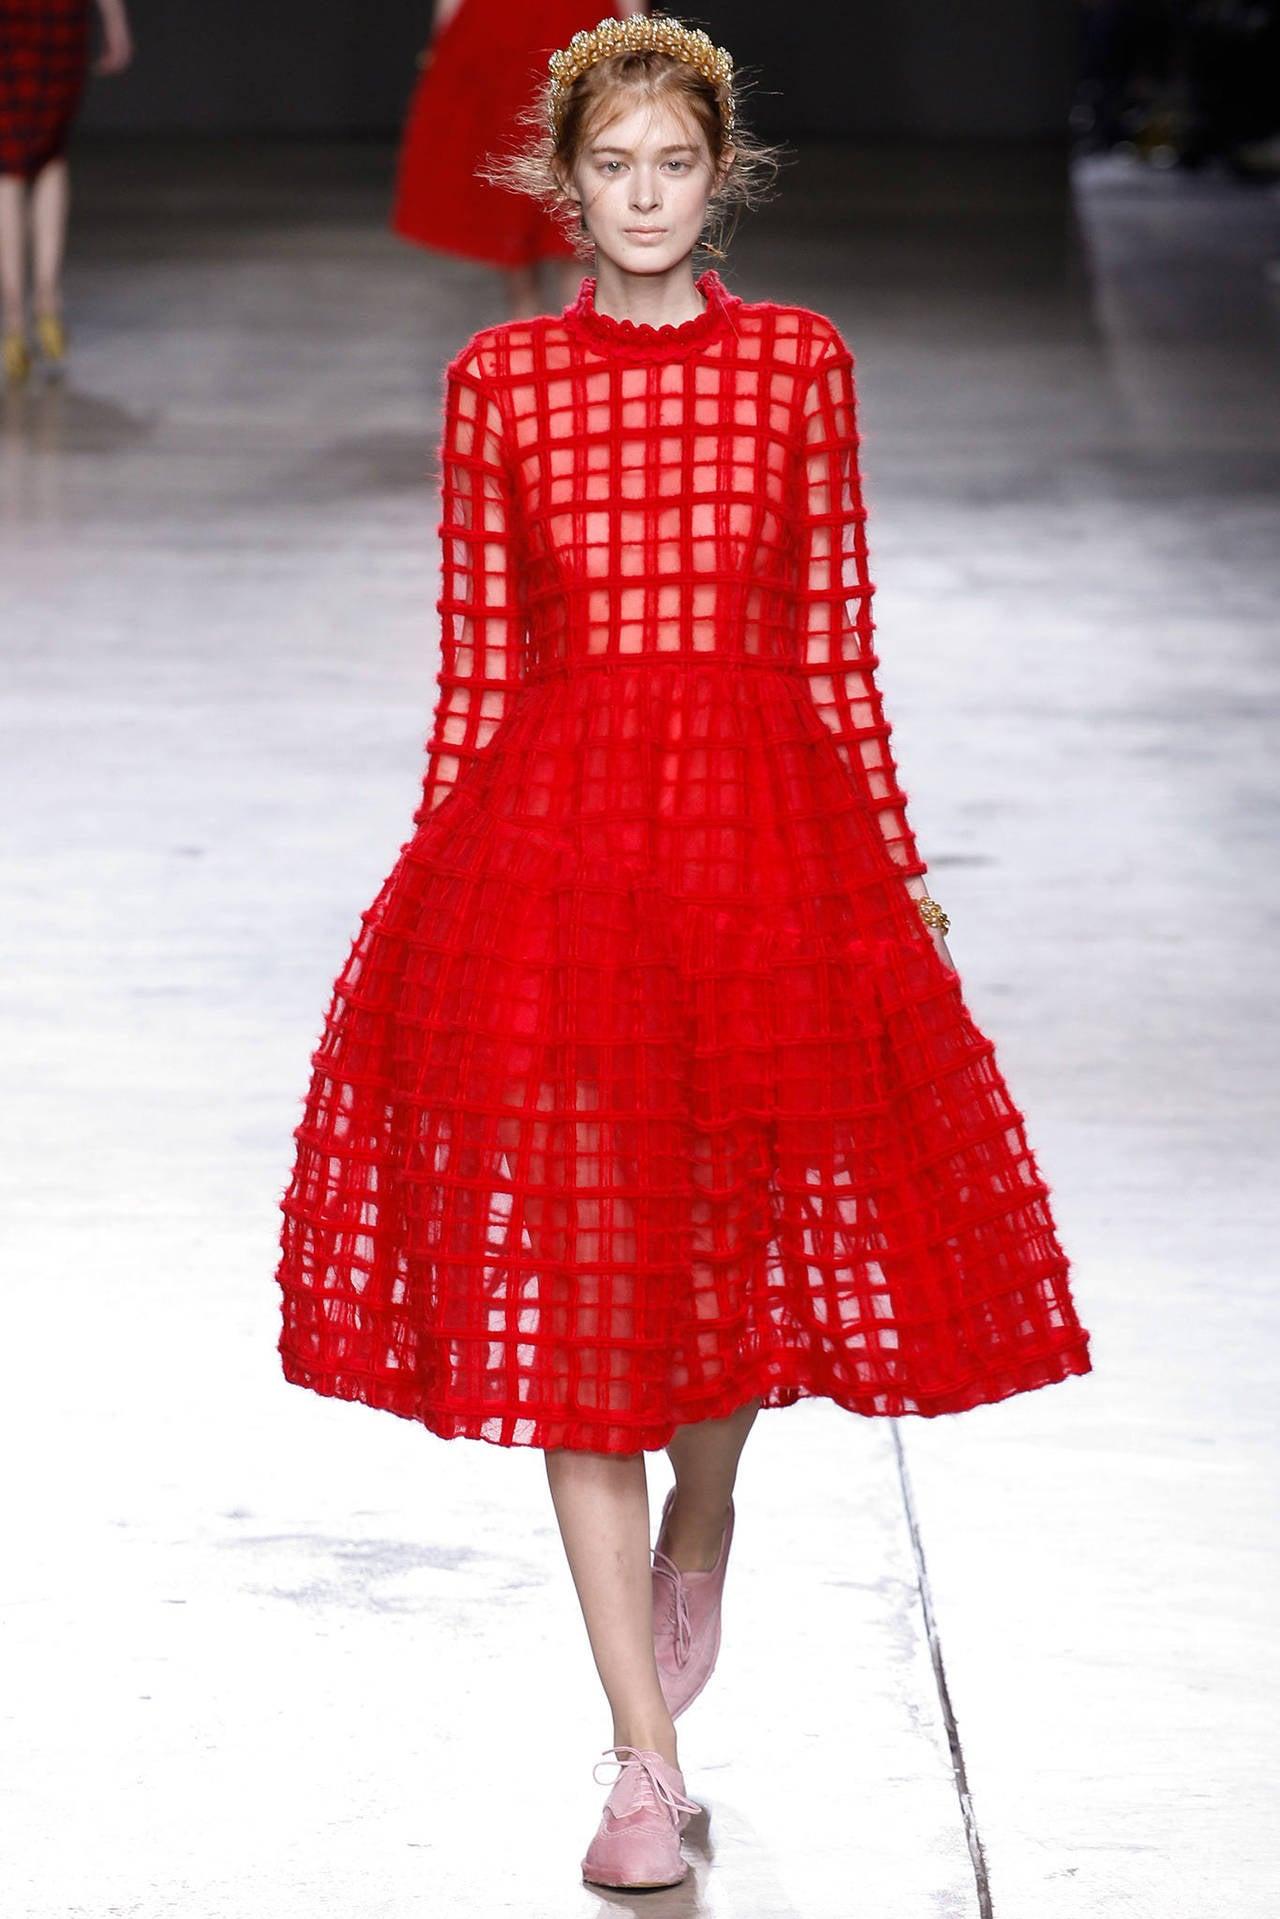 Simone Rocha Fall 2014 Red Runway Dress At 1stdibs